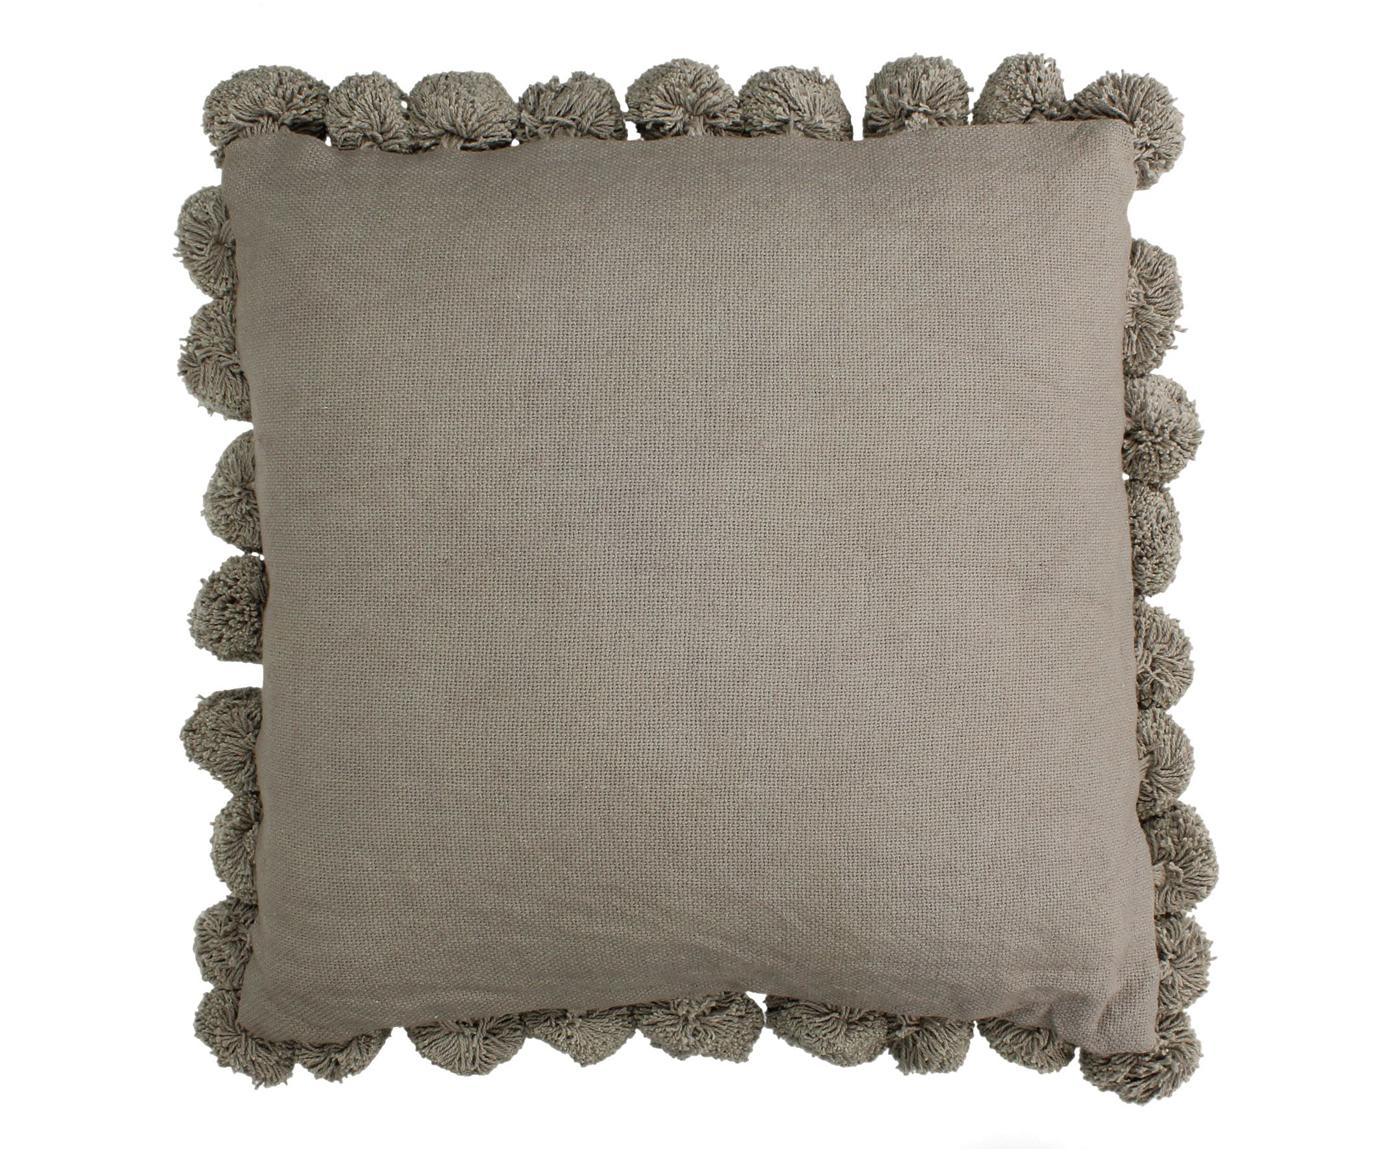 Cuscino con imbottitura e pompon Betta, Grigio, Larg. 45 x Lung. 45 cm